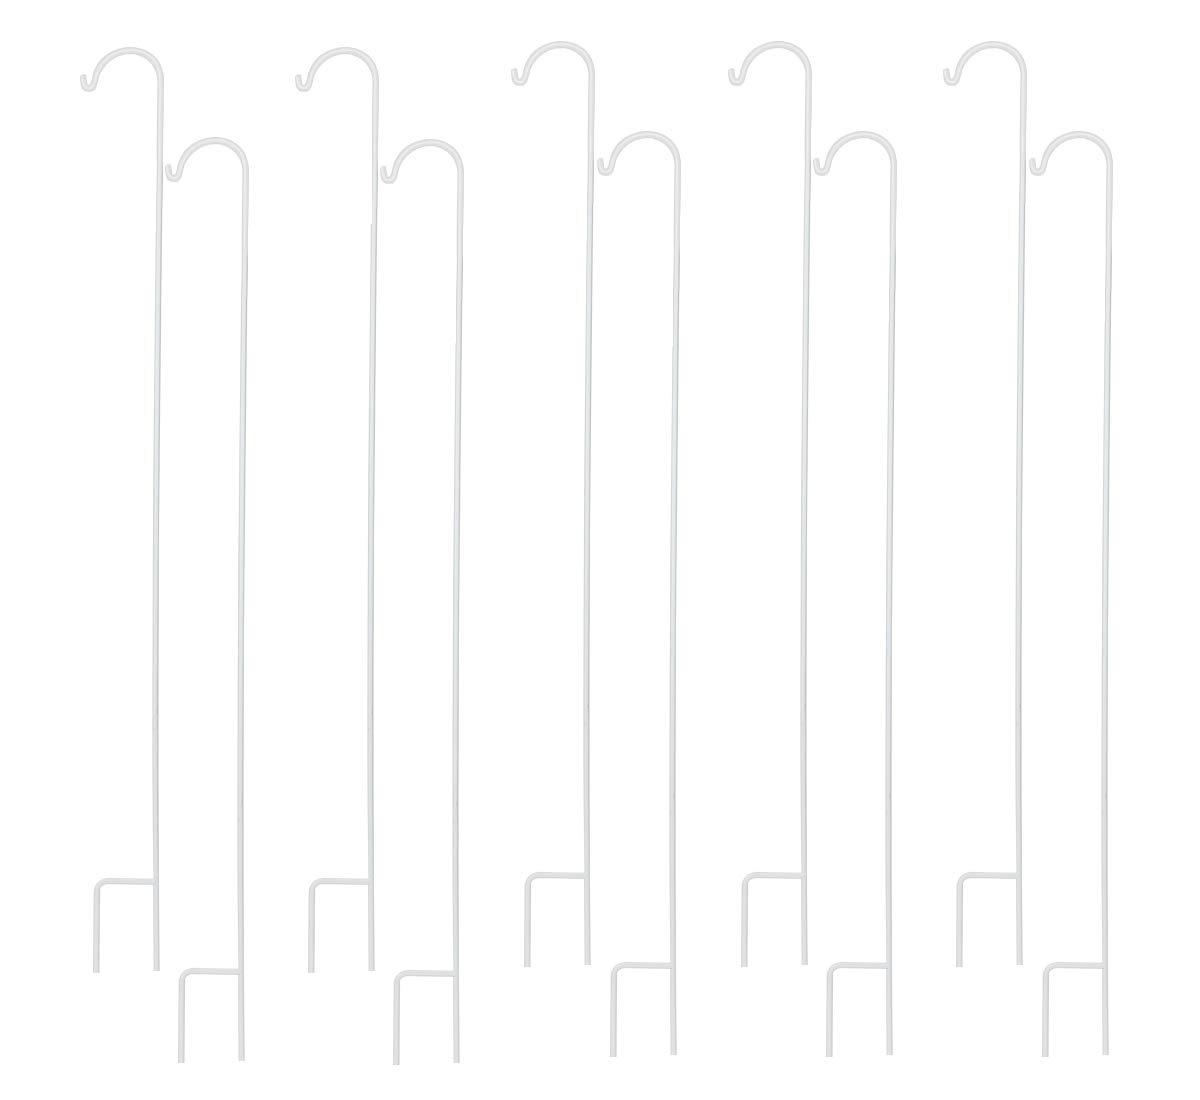 TQVAI 60 Inch Shepherd's Hooks Set of 10 - Garden Stake Hangers for Hanging Solar Lights, Bird Feeders, Mason Jars, Christmas Lights, Lanterns, Weddings, Frosted White